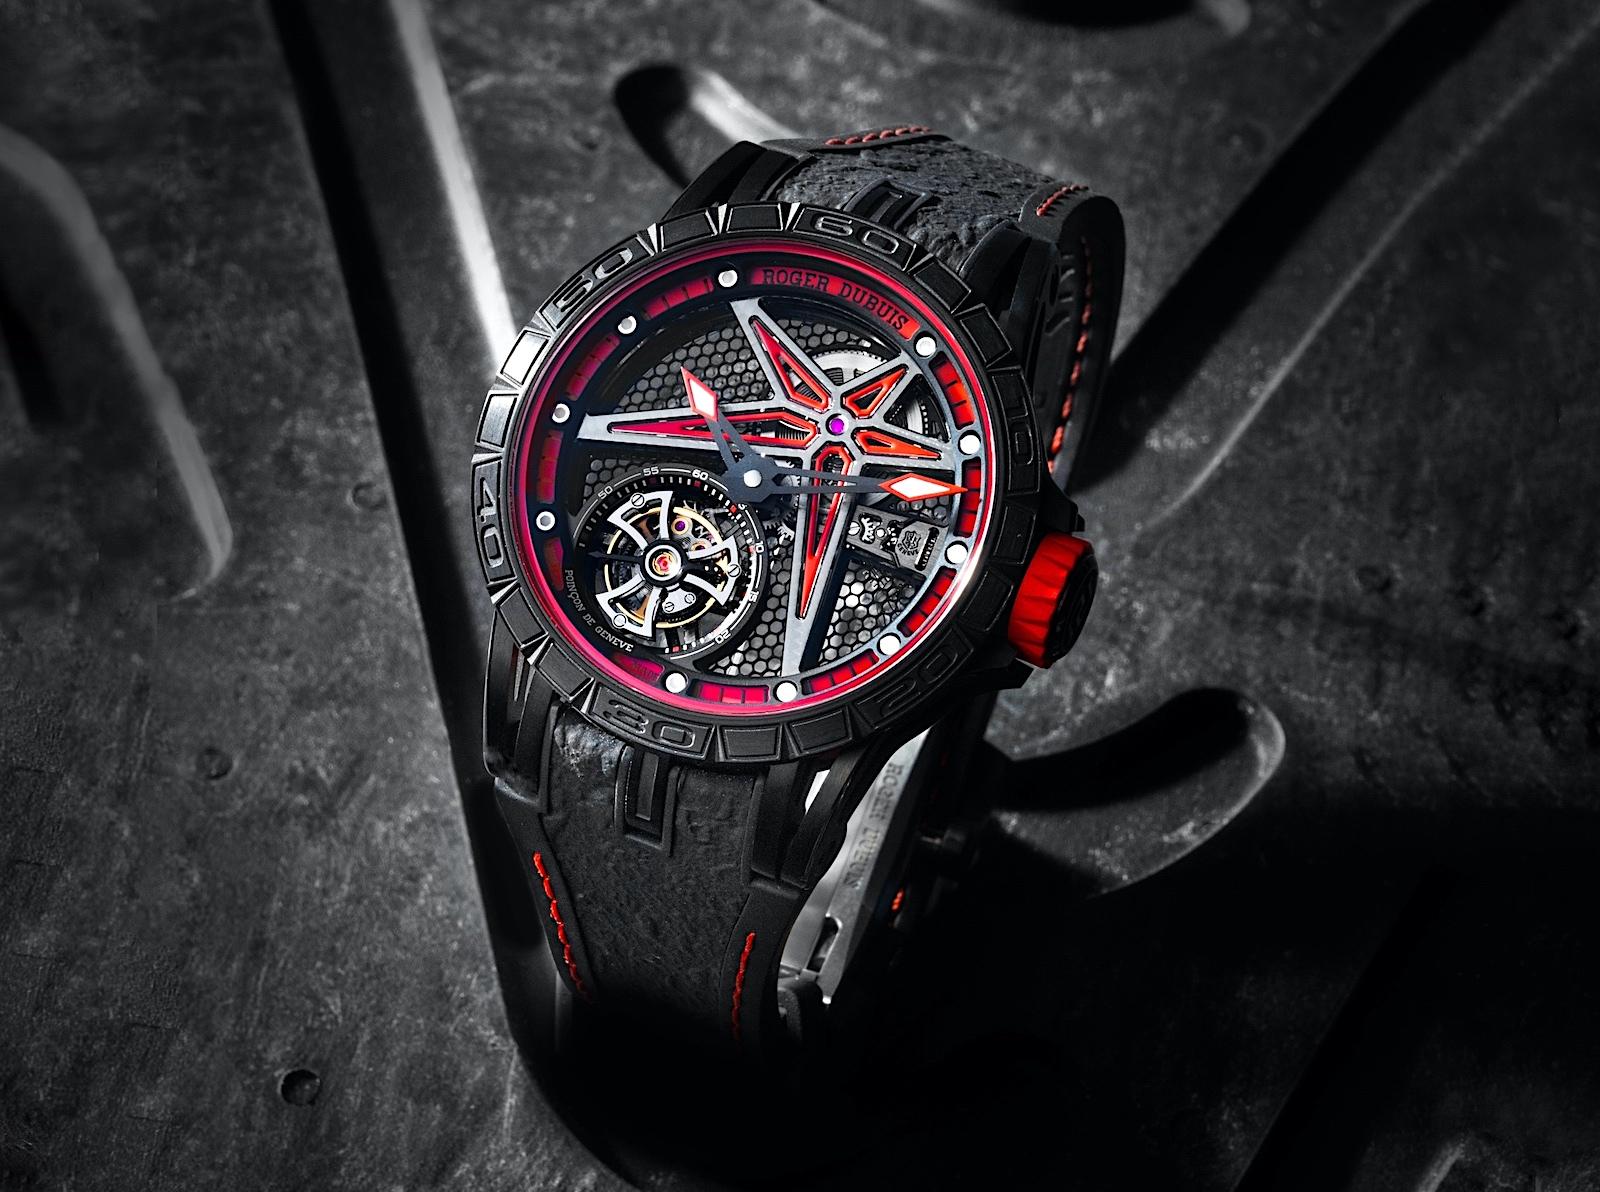 Roger Dubuis Excalibur Spider Flying Tourbillon 39 - Pirelli 02